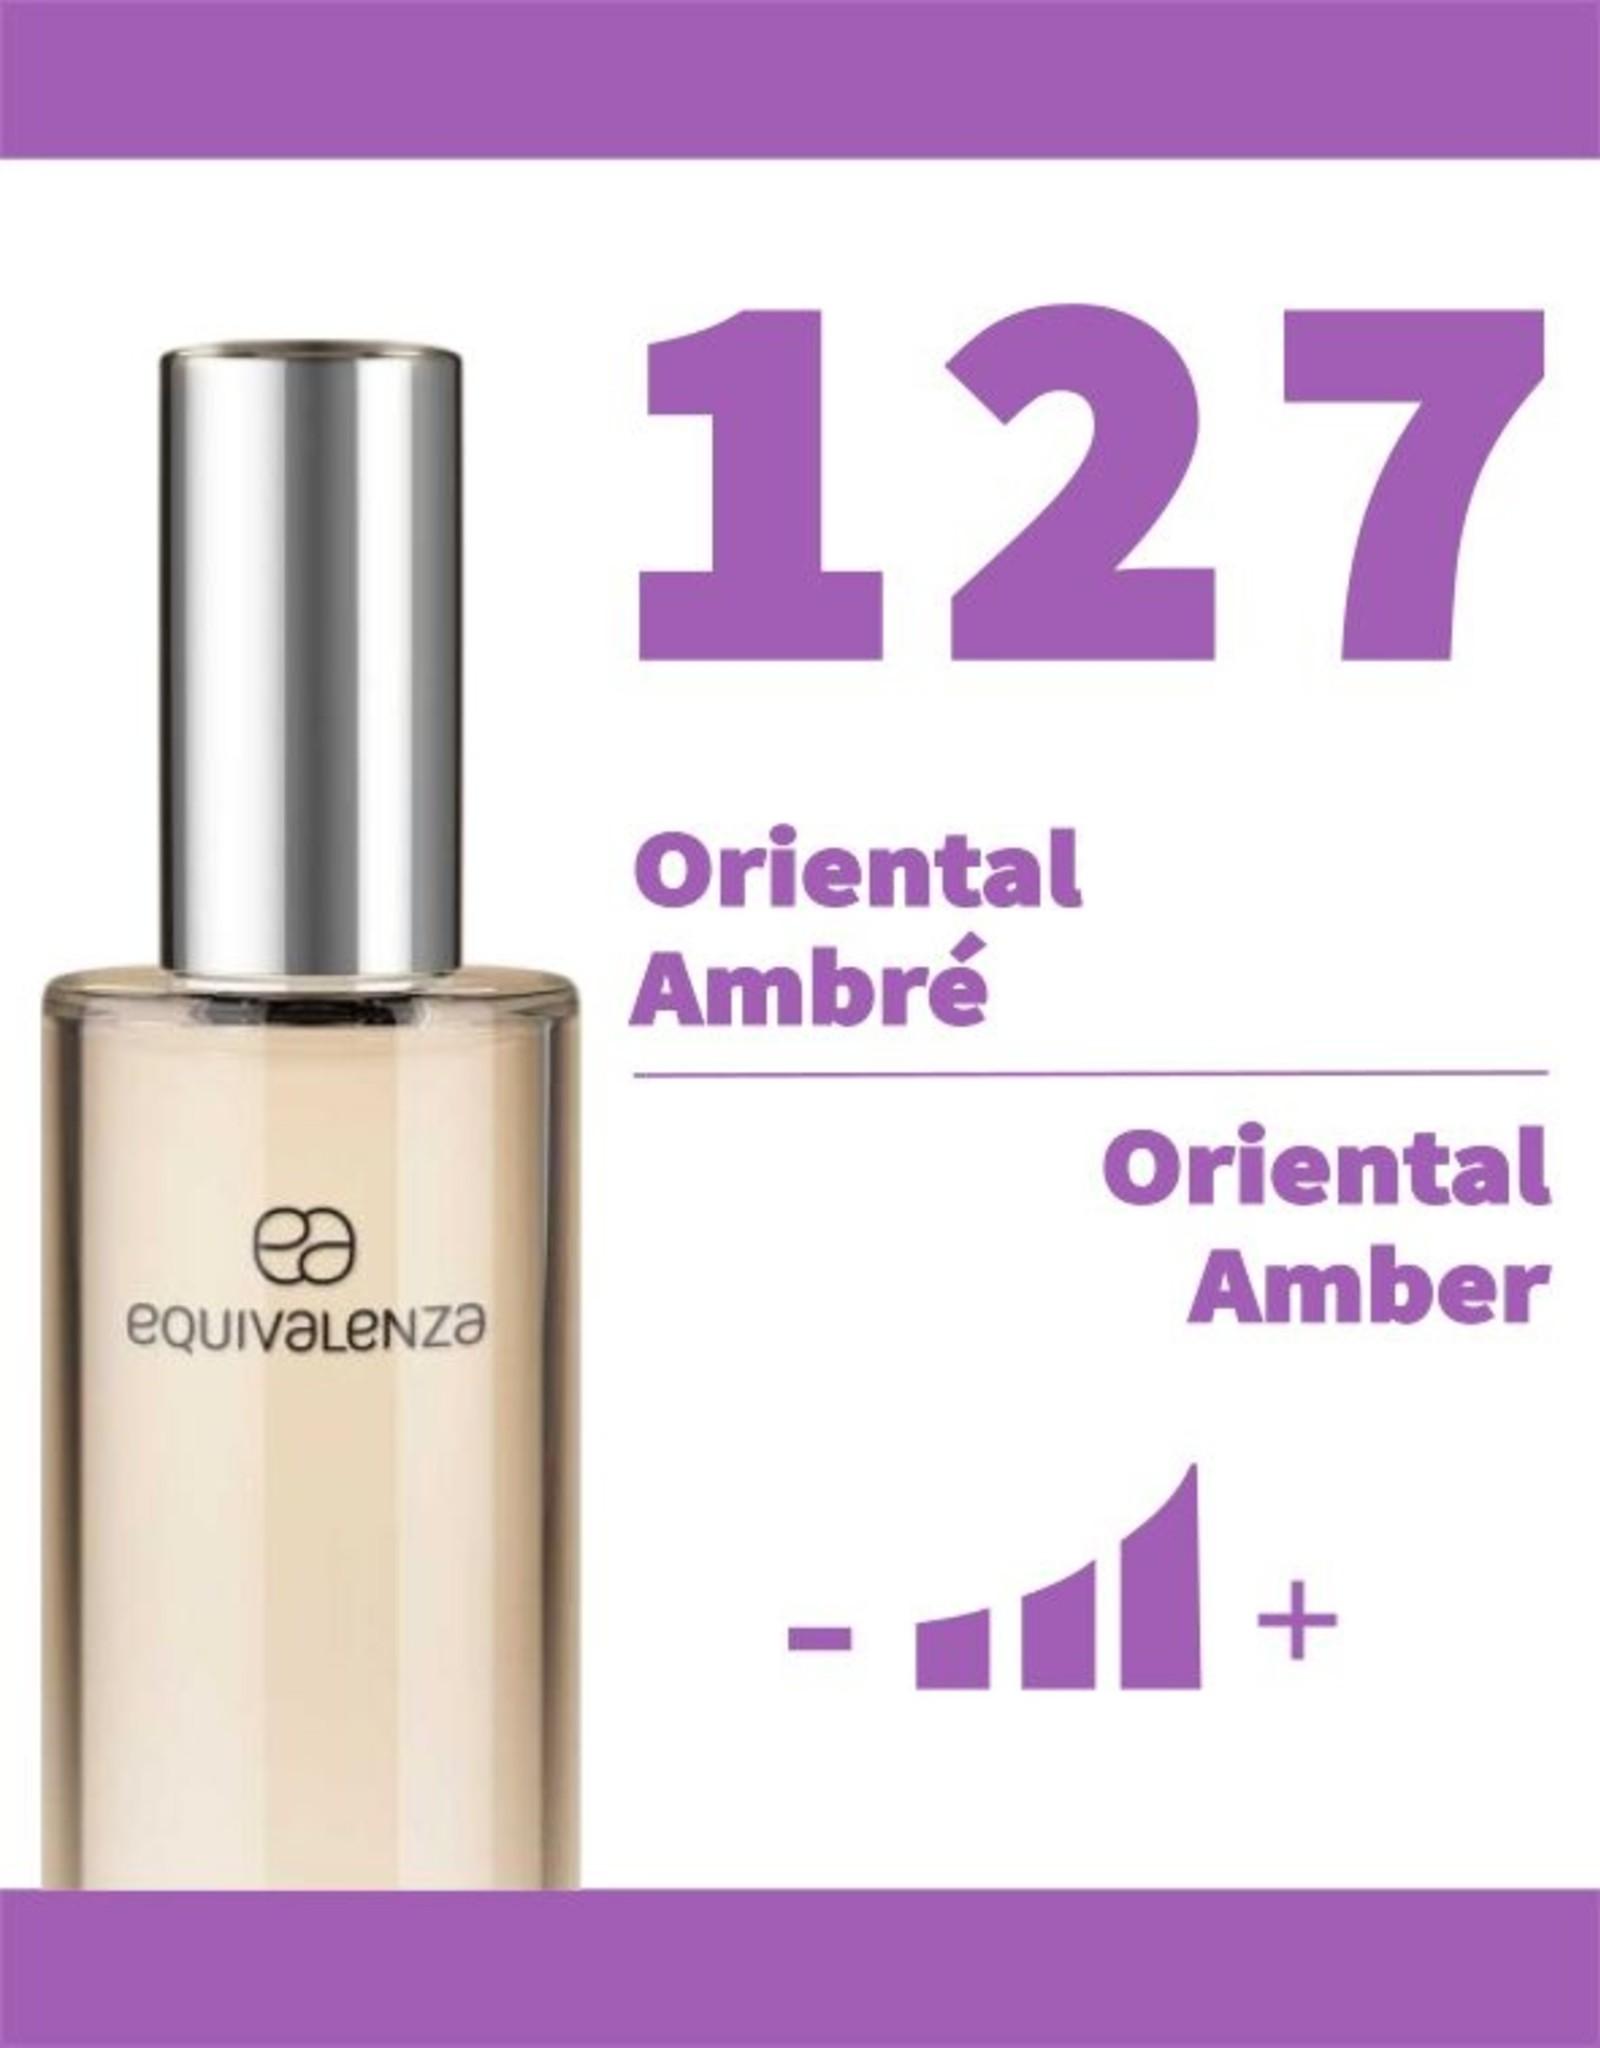 Equivalenza Oriental Amber 127